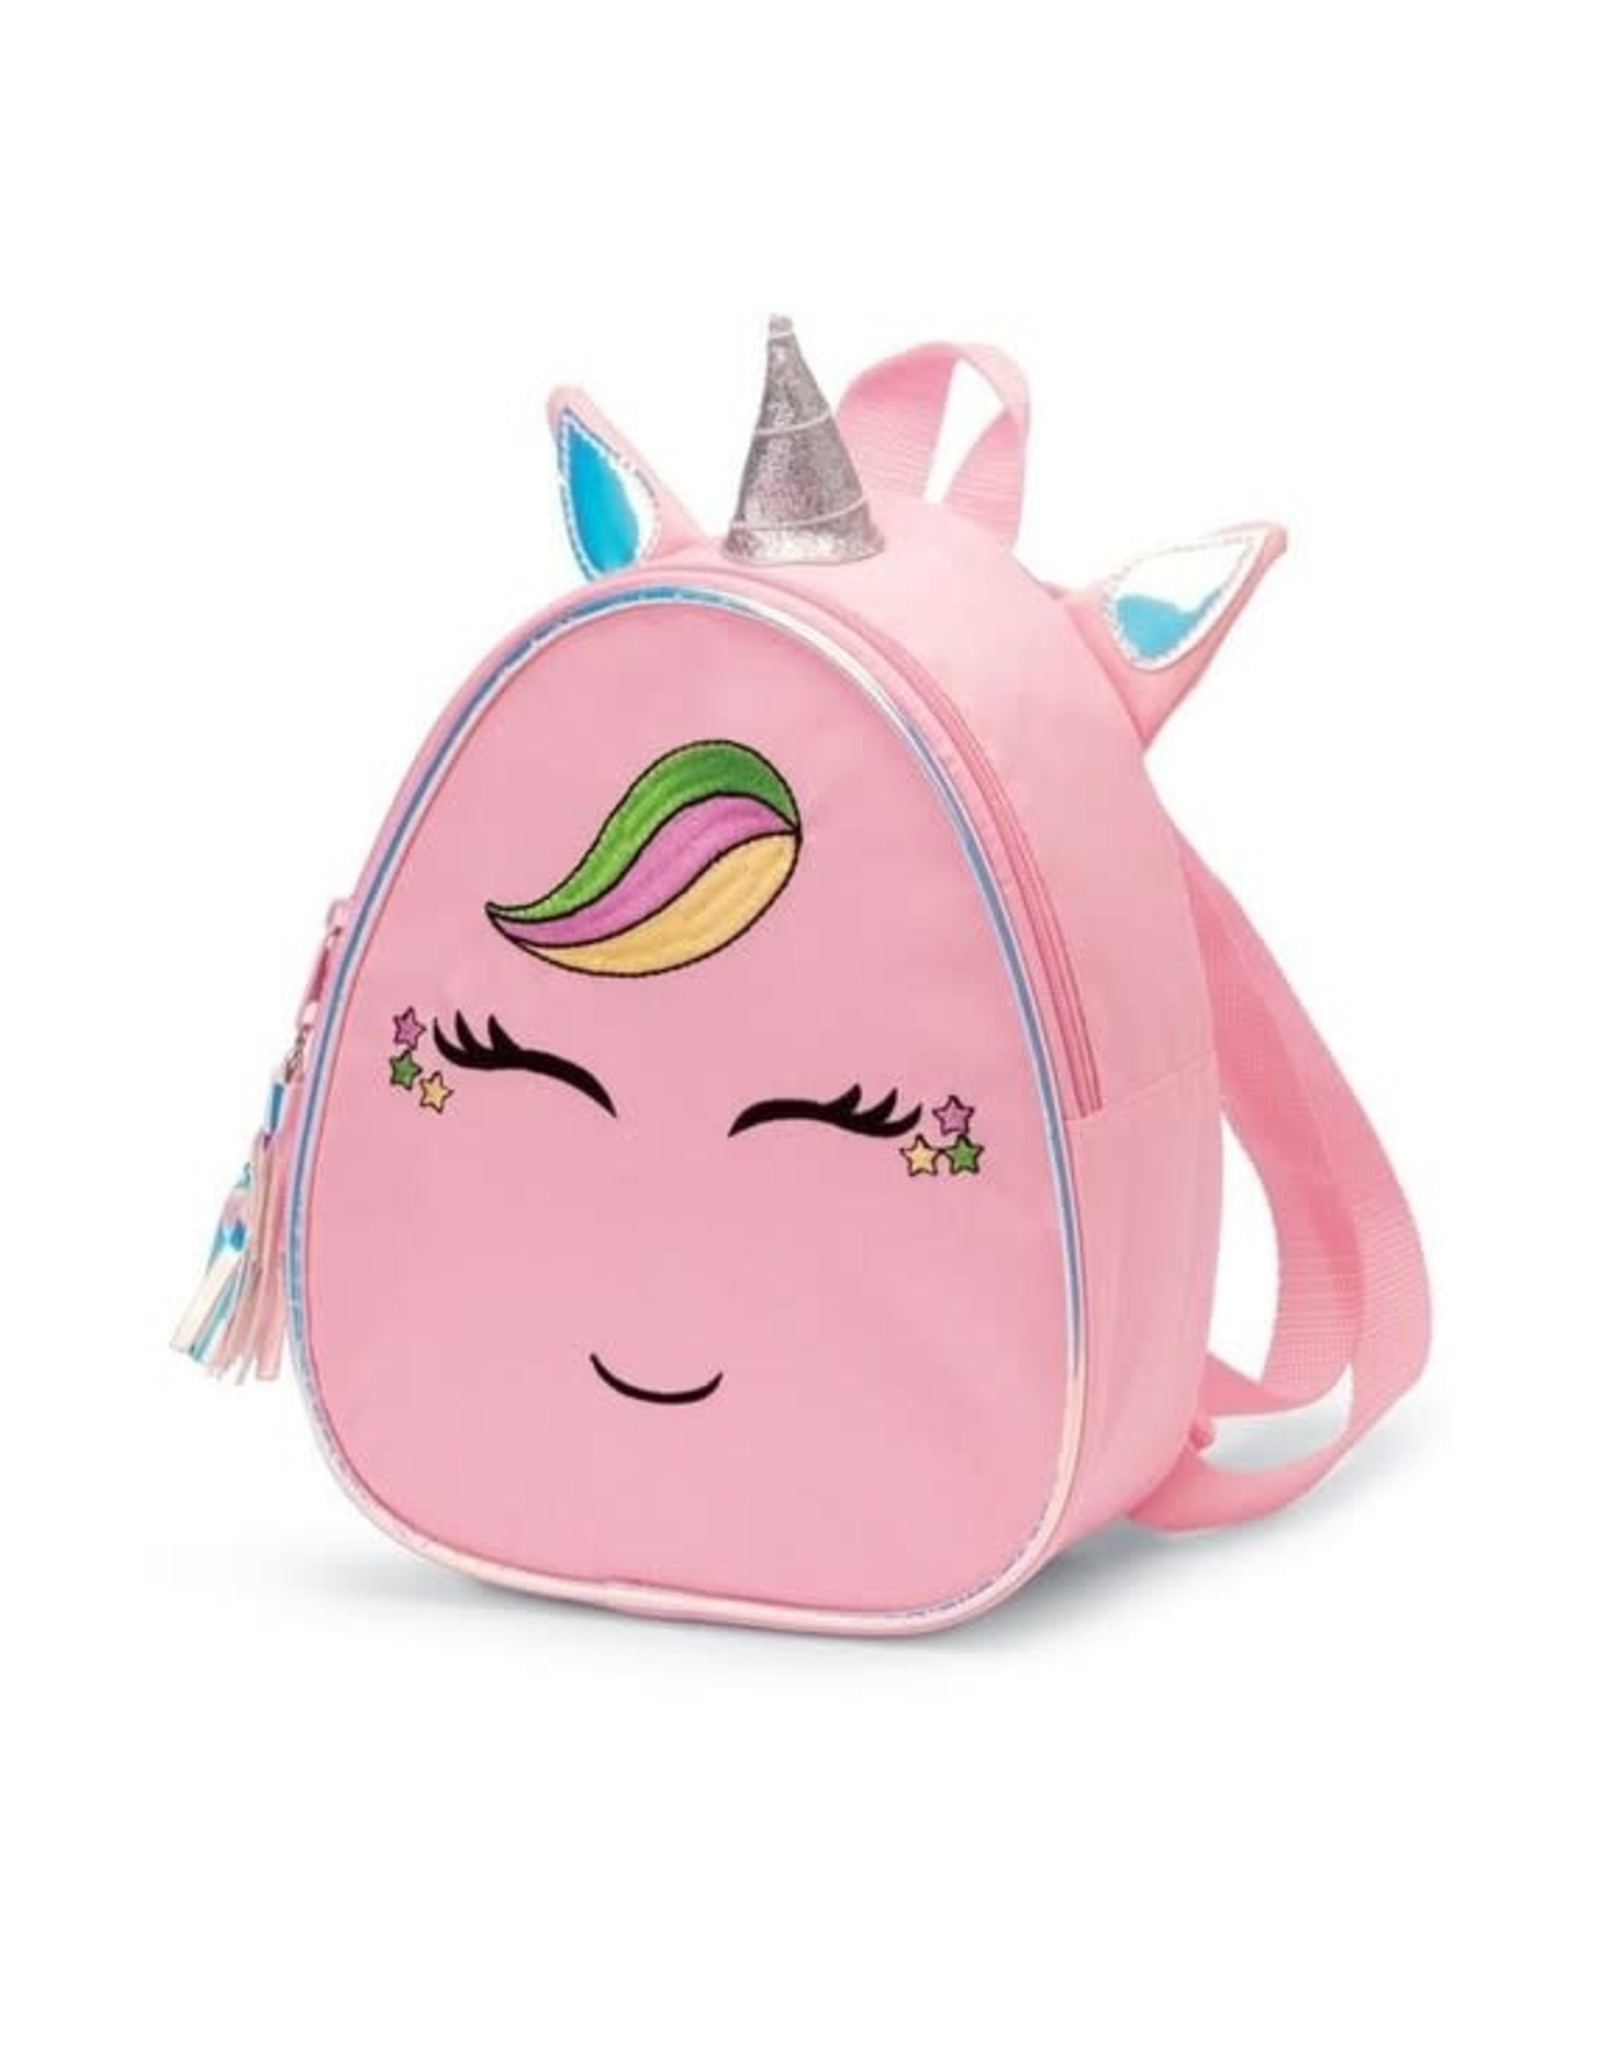 B248 Groovycorn Backpack